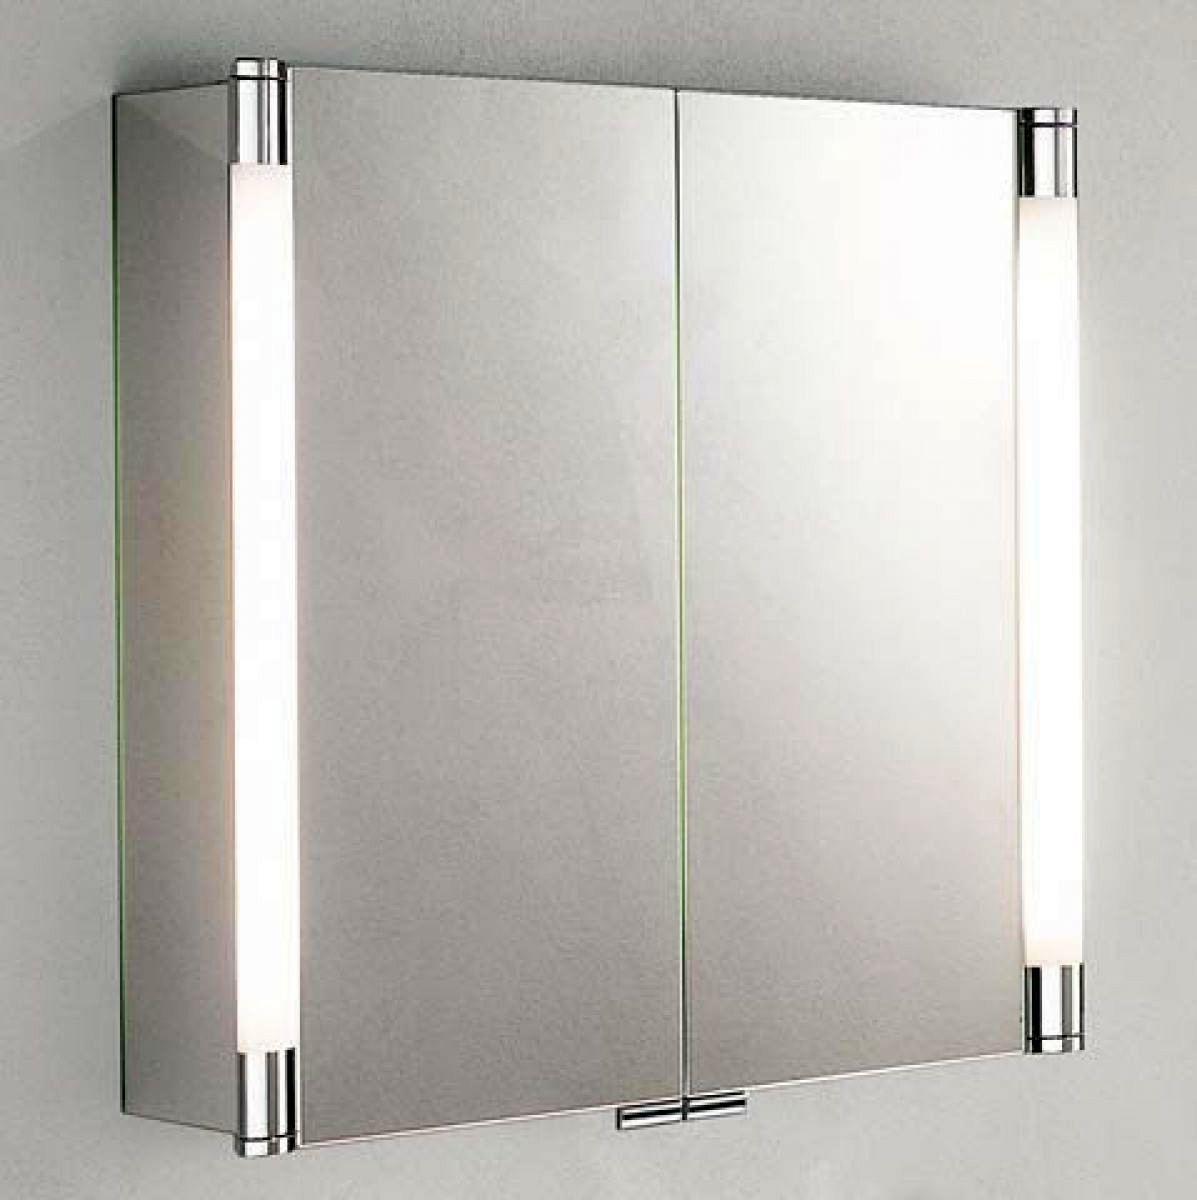 Keuco Royal T2 Mirror Cabinet Uk Bathrooms